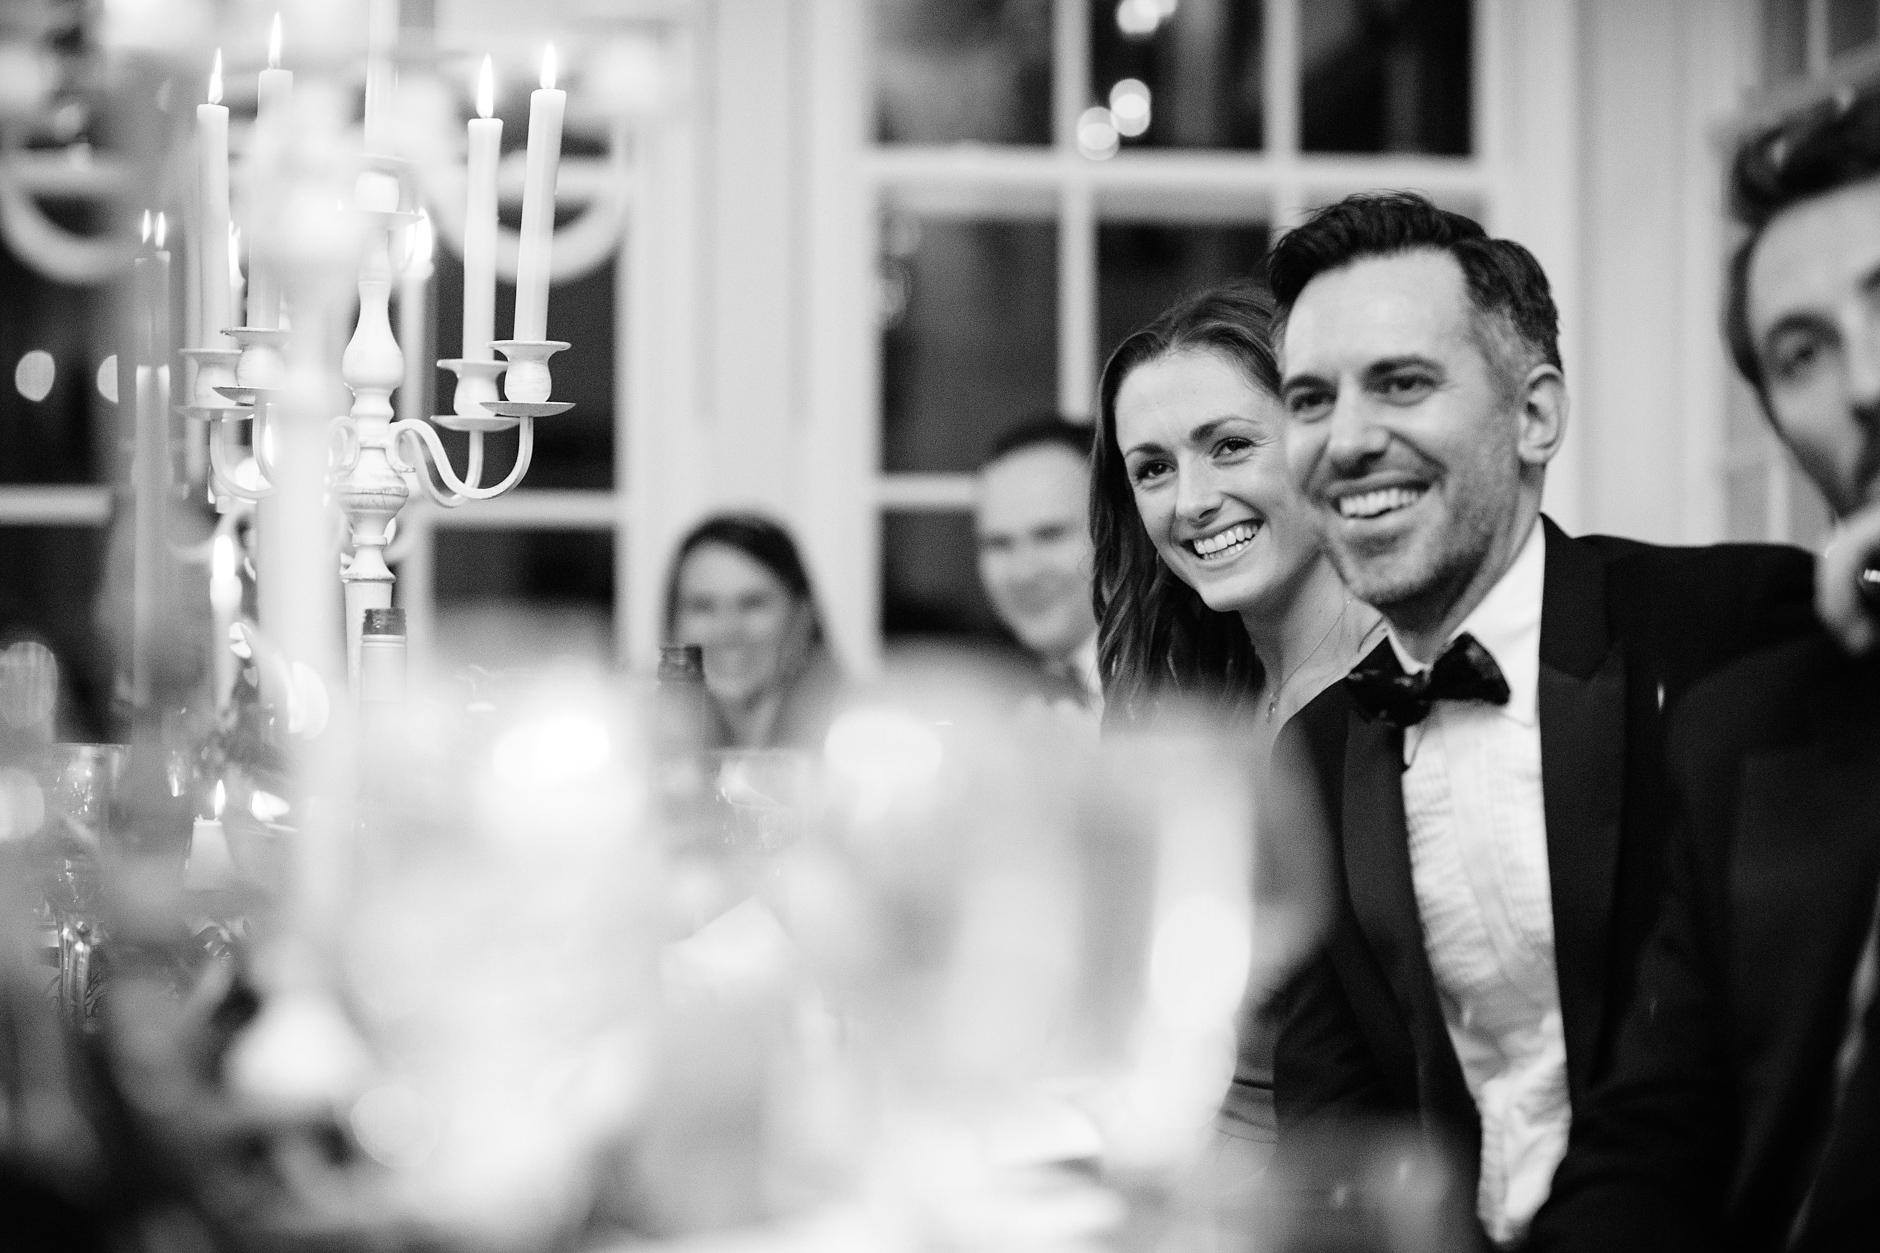 Glentruim-Wedding-Nikki-Leadbetter-Photography-276.jpg